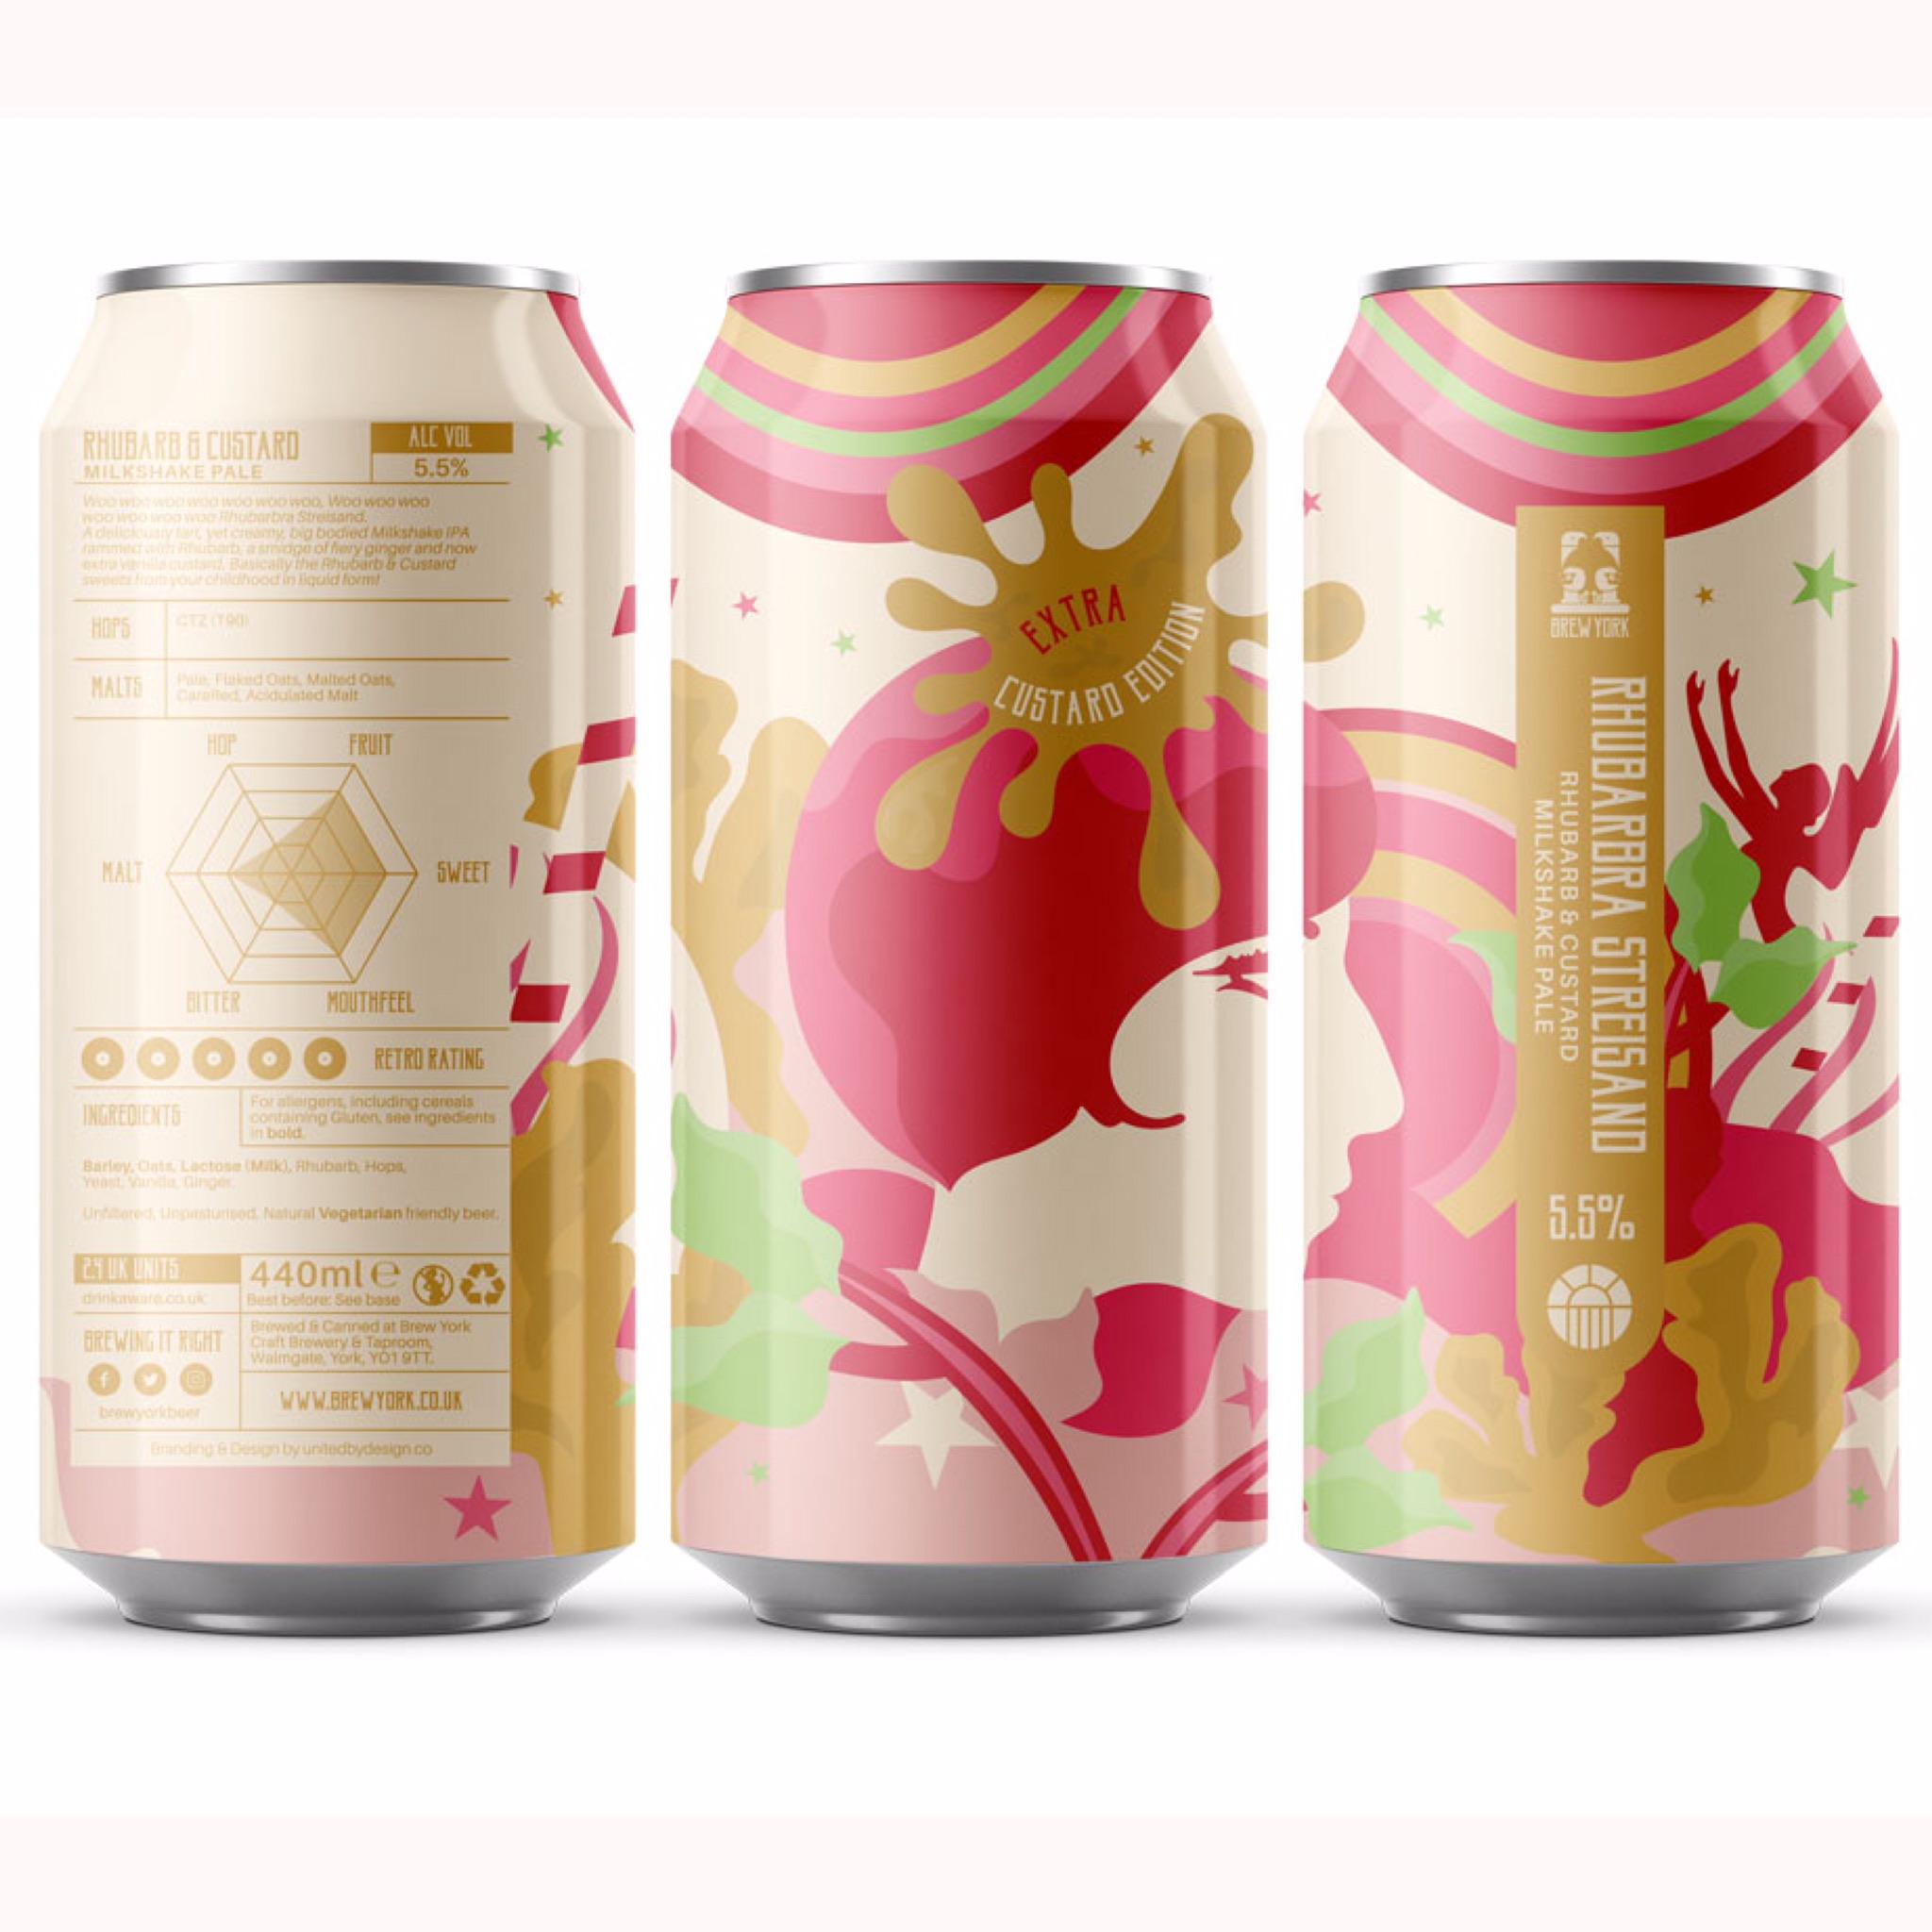 Rhubarbra Streisand Extra Custard Edition 5.5% 440ml Brew York